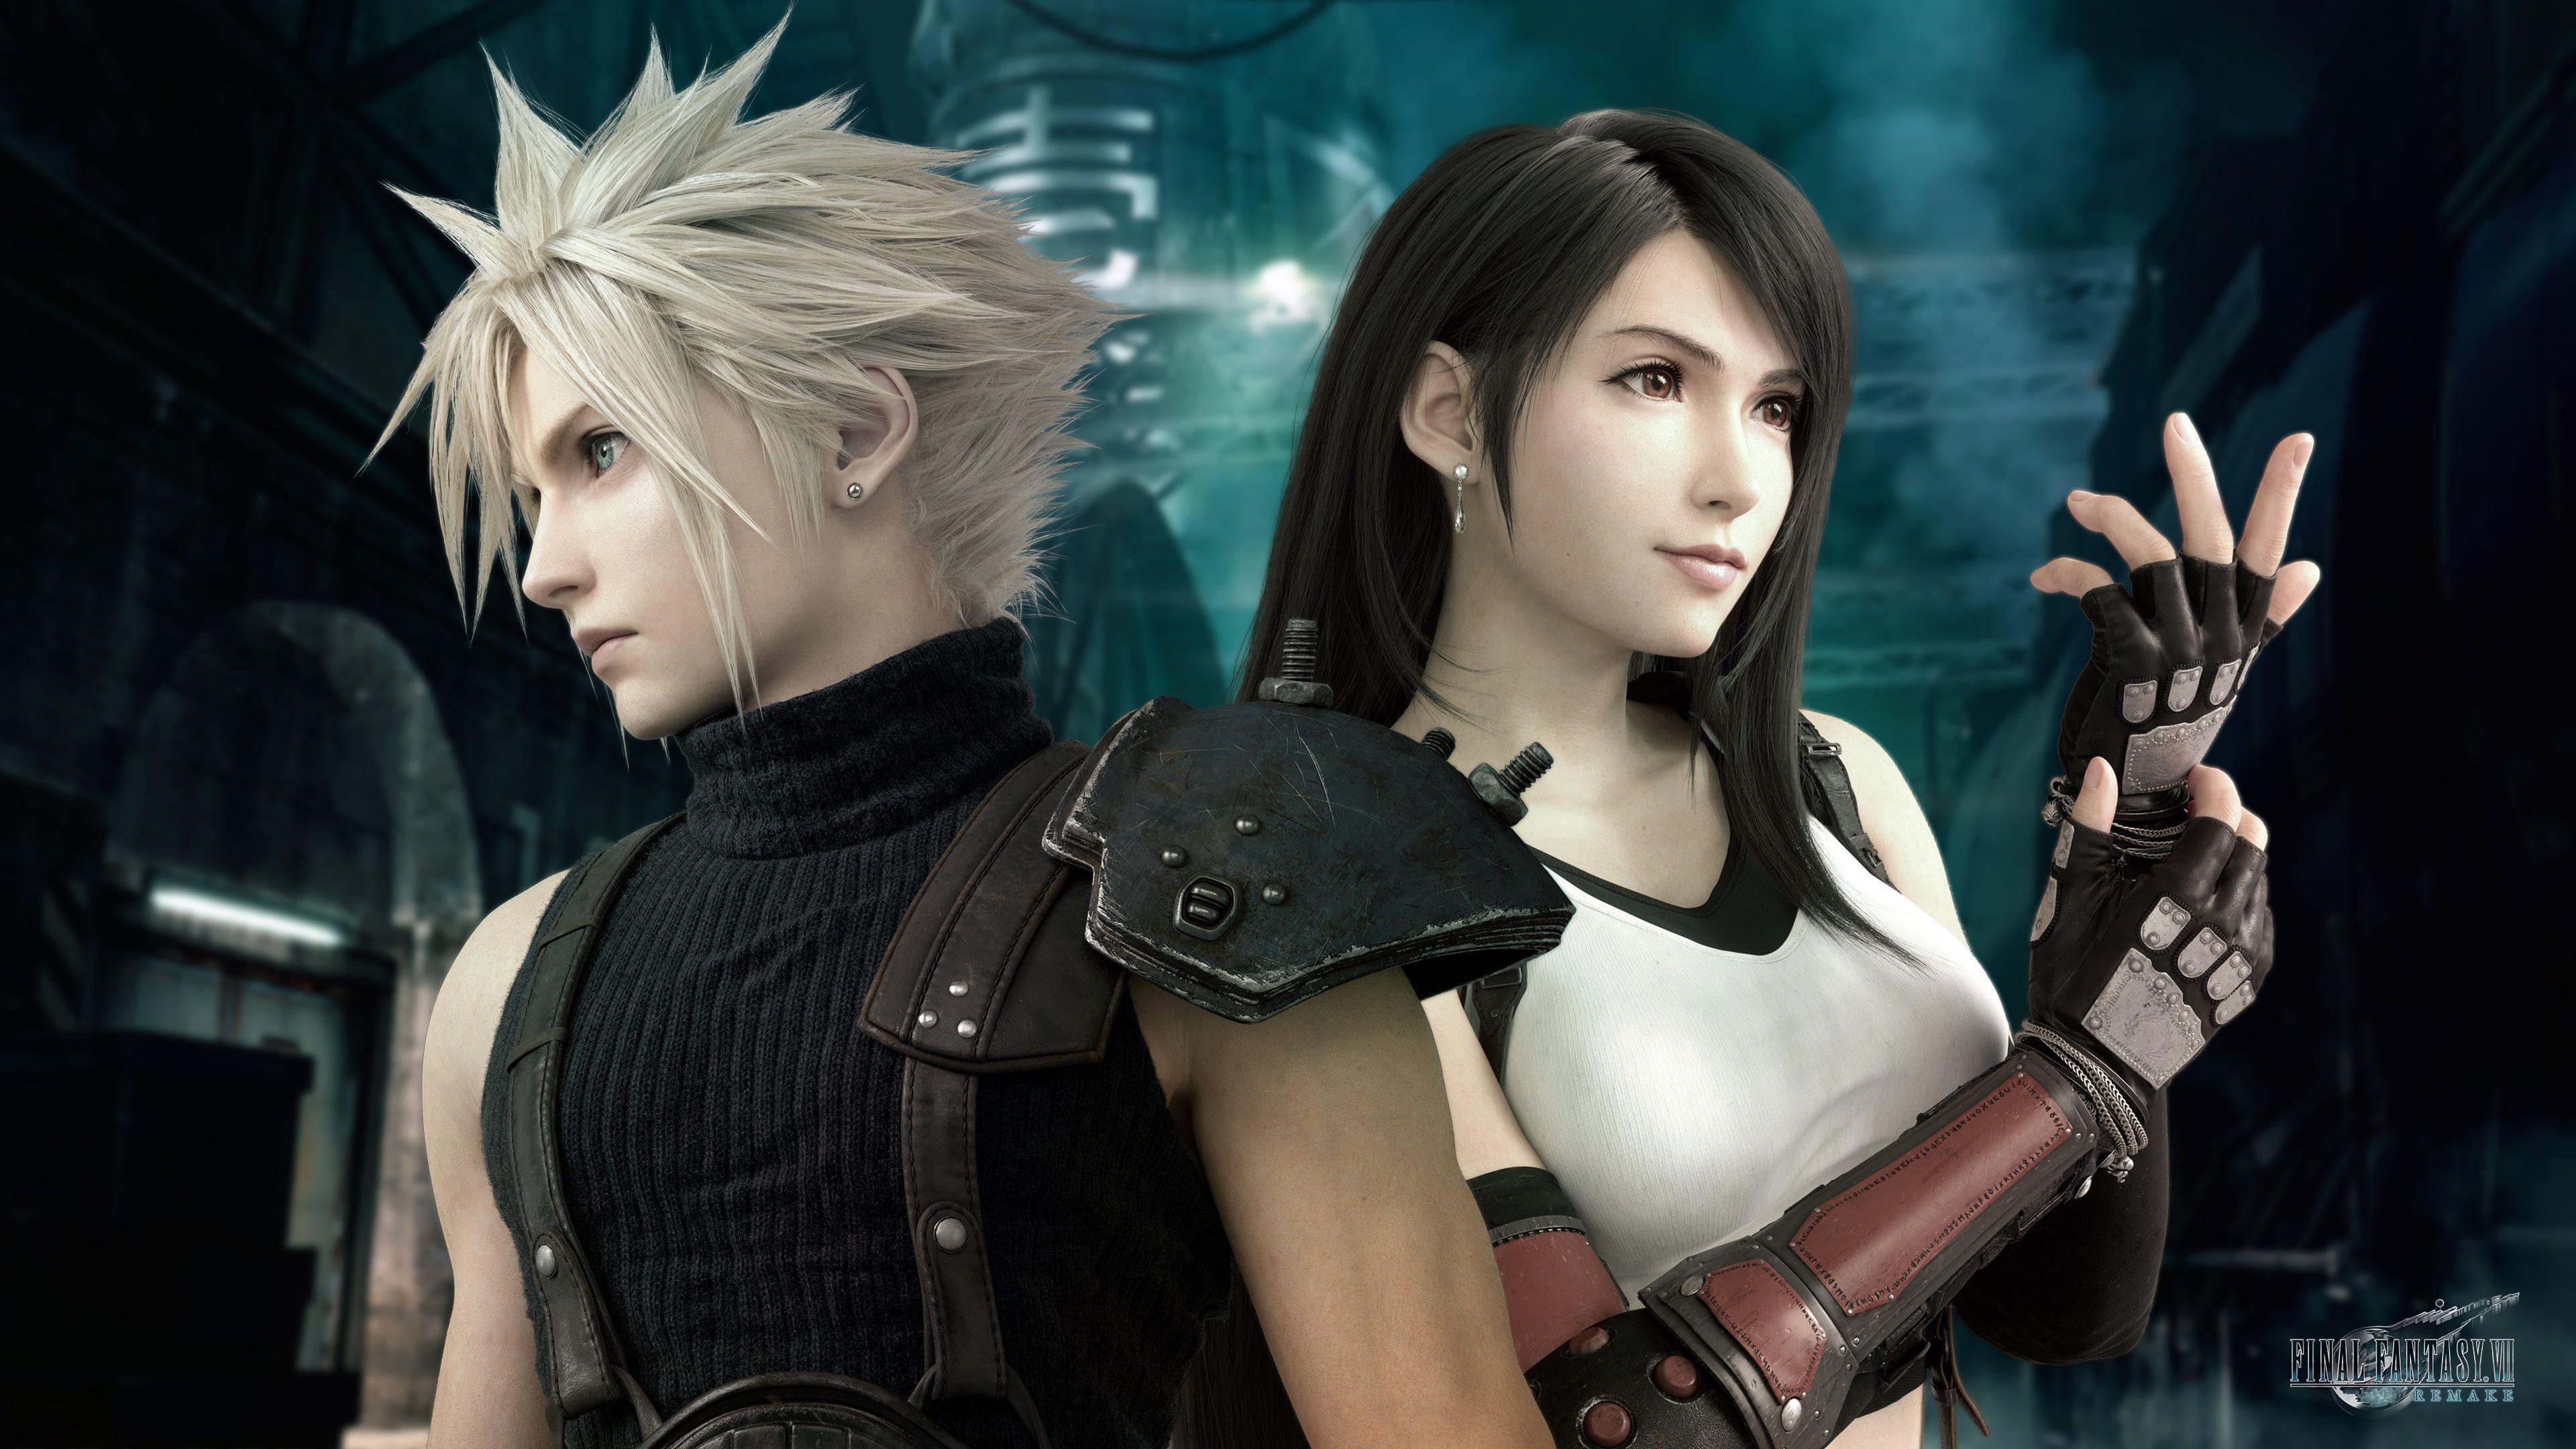 Final Fantasy Vii Remake Tifa Lockhart Cloud Strife Final Fantasy Vii 4k Wallpaper Hdwallpaper De Final Fantasy Vii Cloud Cloud And Tifa Final Fantasy Vii